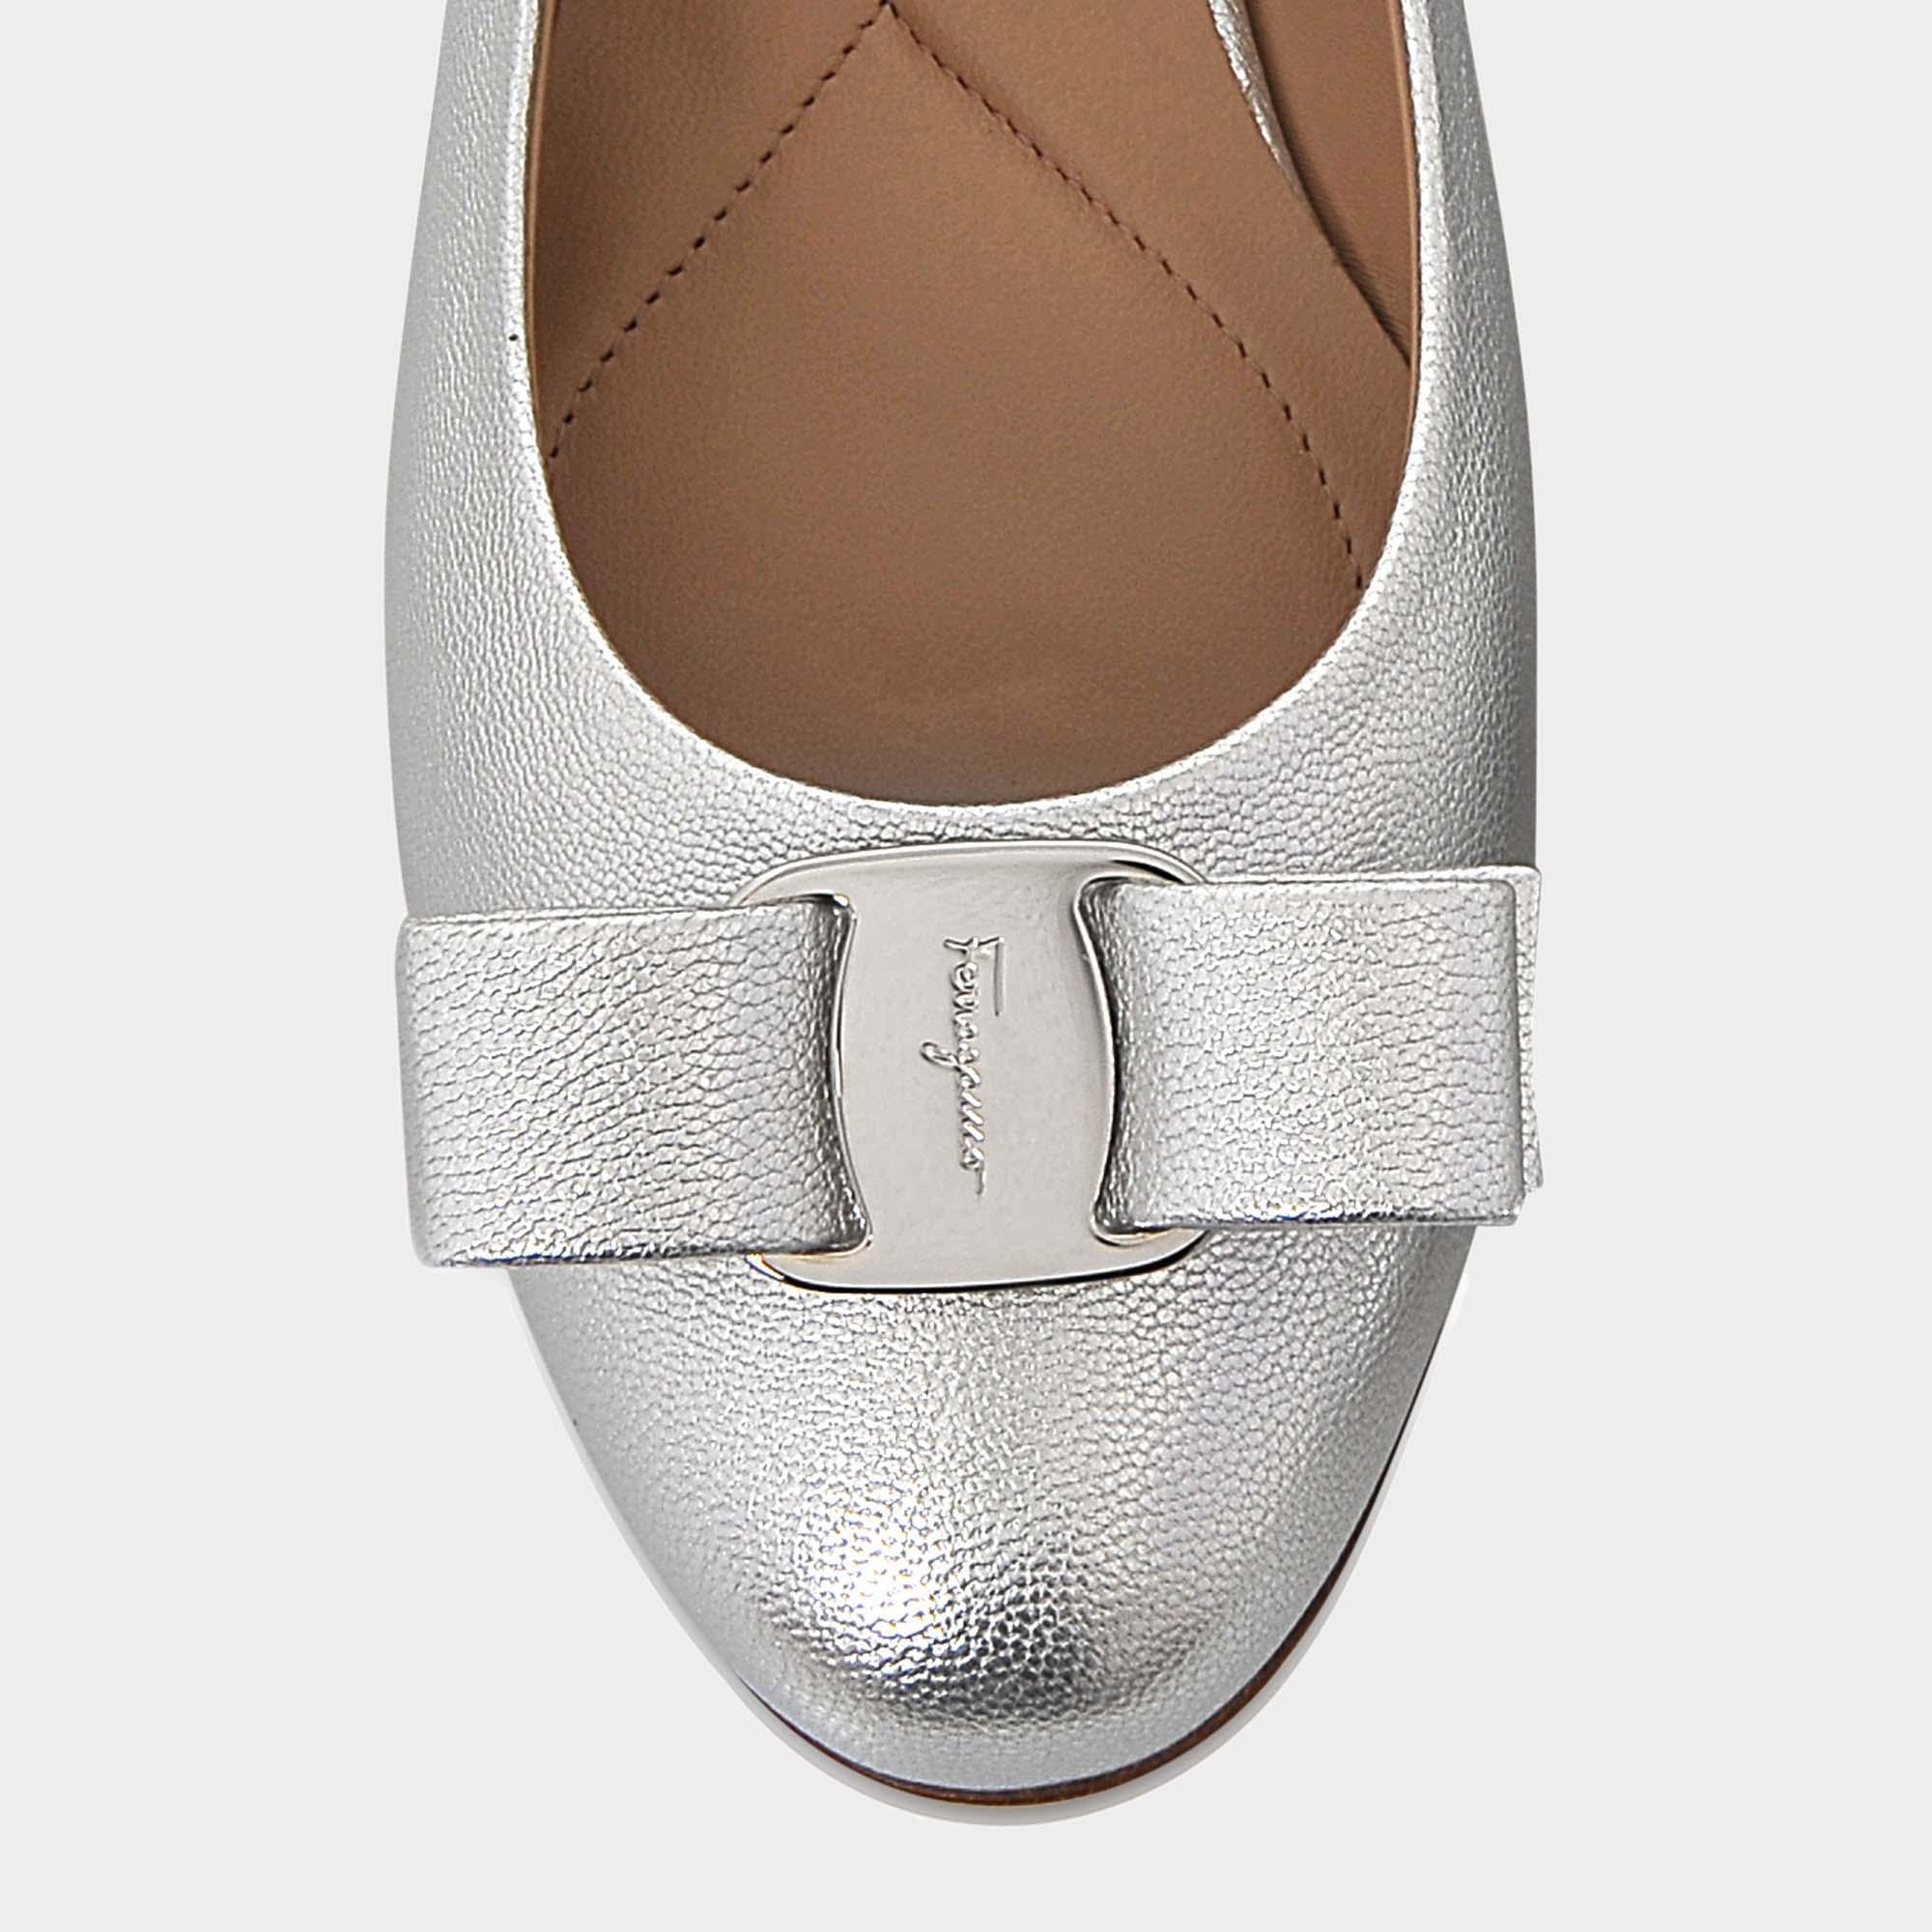 Varina Metallic Shoes in Silver Flair Silk Salvatore Ferragamo TcZvNeyNJ9